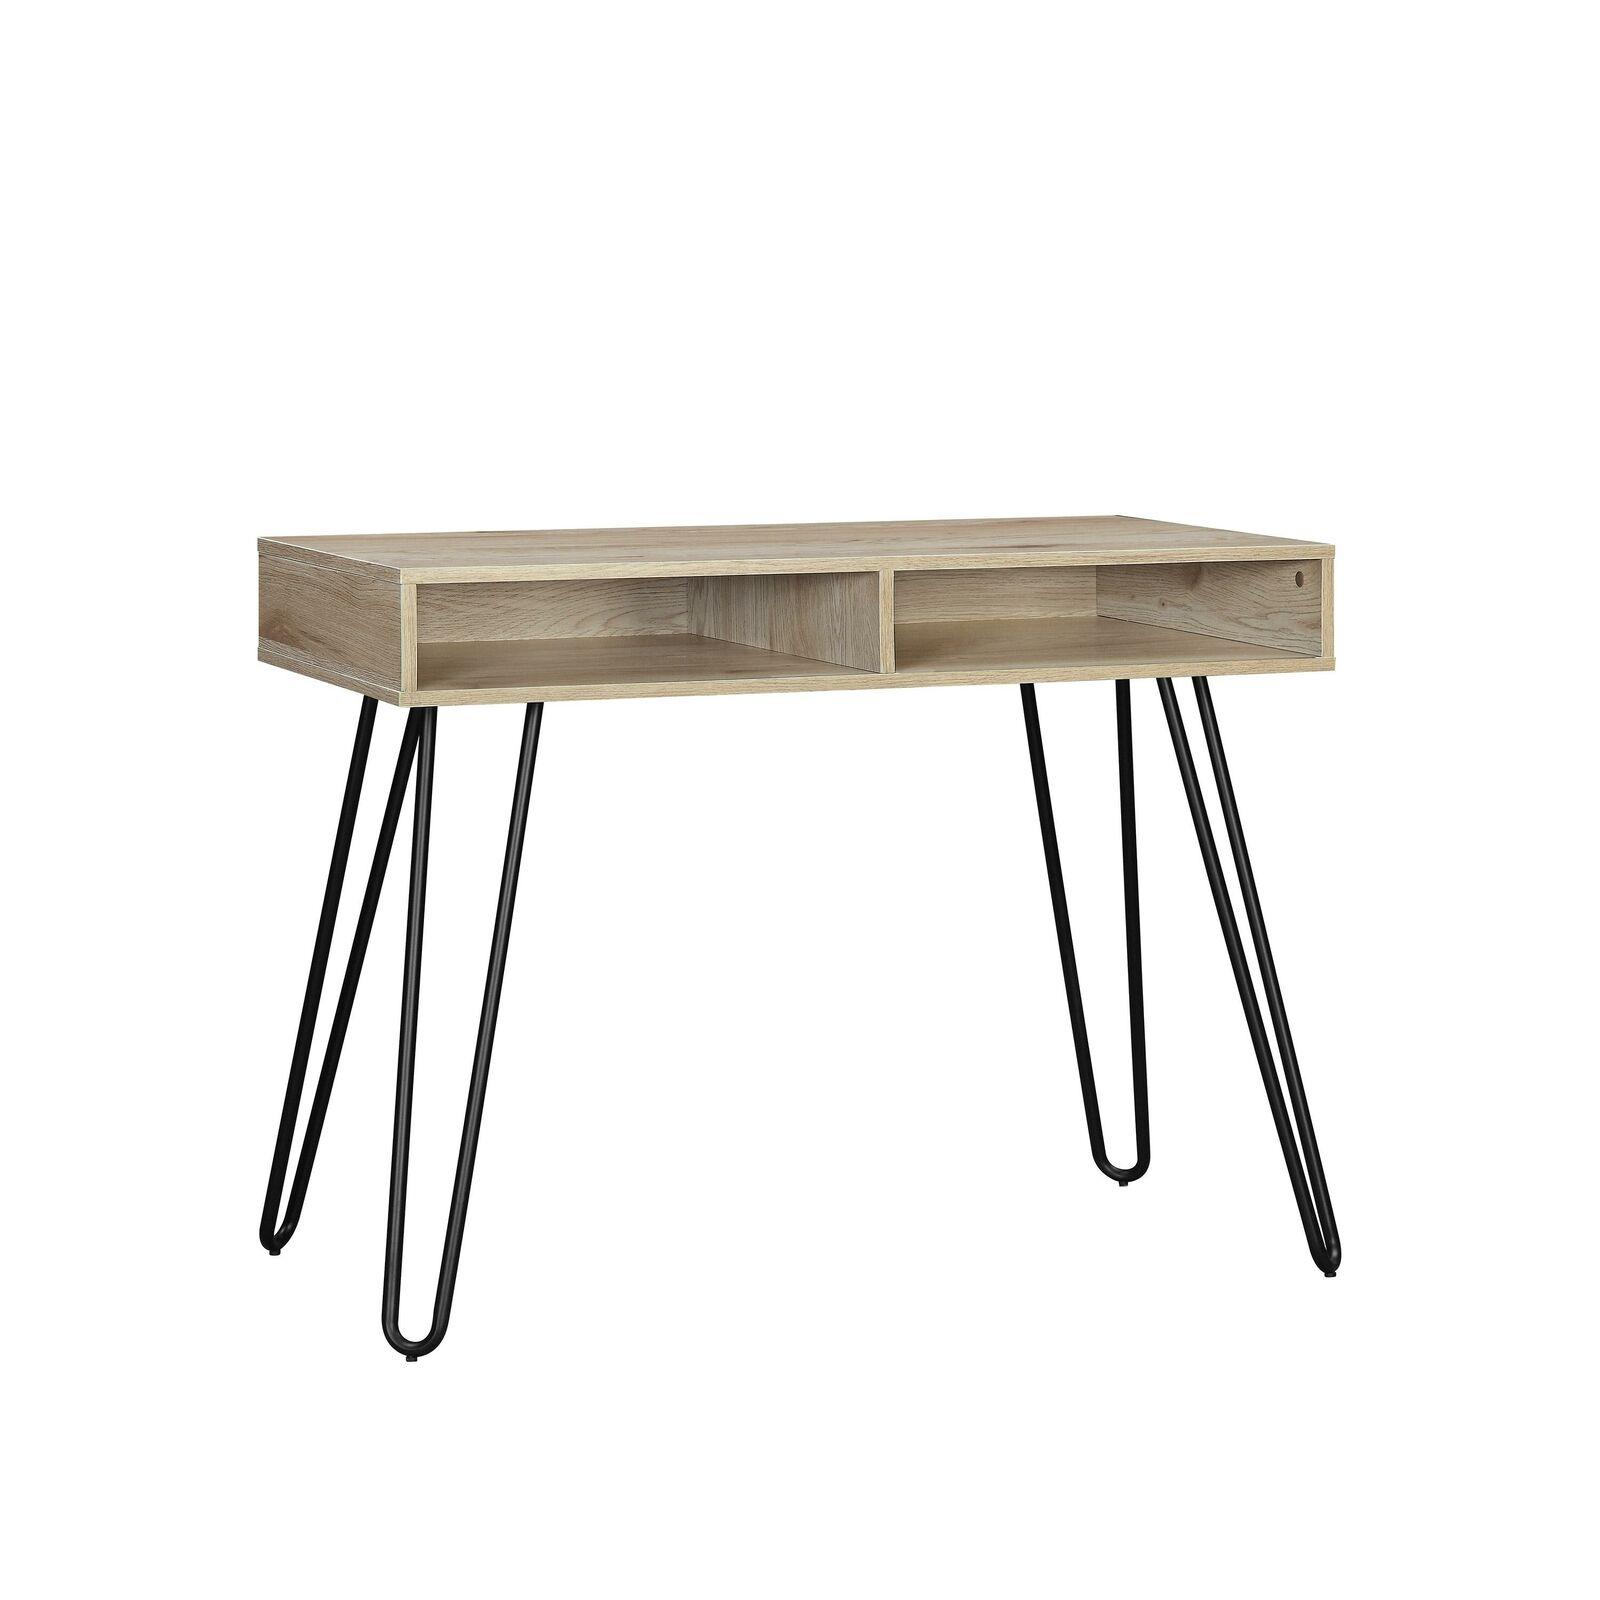 Mainstays 2 Tier Writing Desk Multiple Finishes For Sale Online Ebay